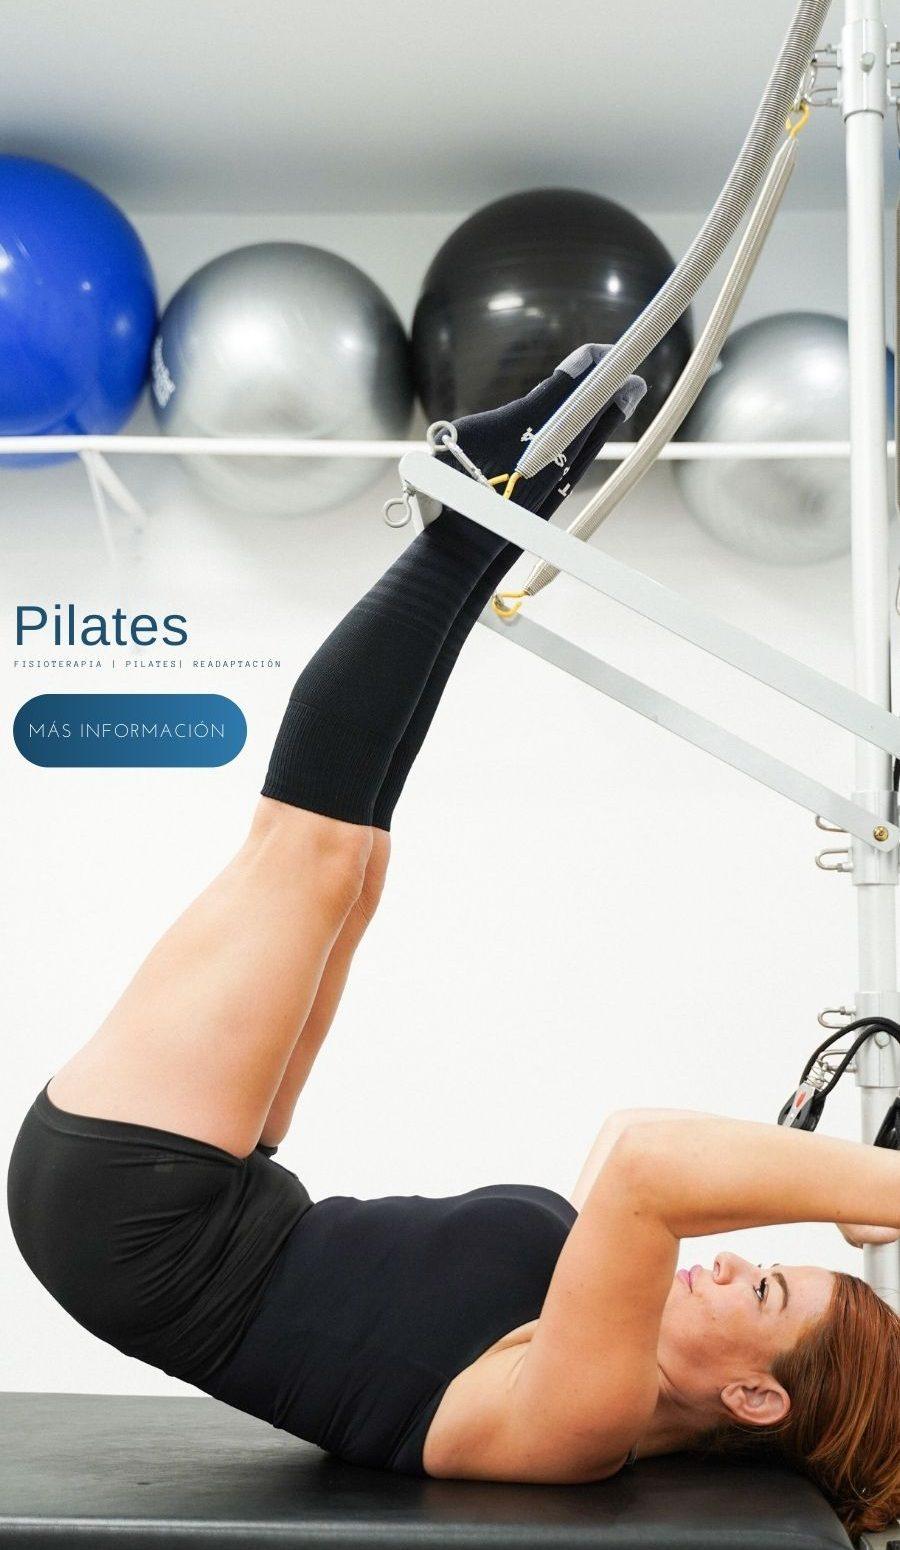 Fisioterapia Tenerife Sur, Pilates Reformer en Tenerife Sur   Physiotherapy Tenerife South, Pilates Reformer Tenerife South